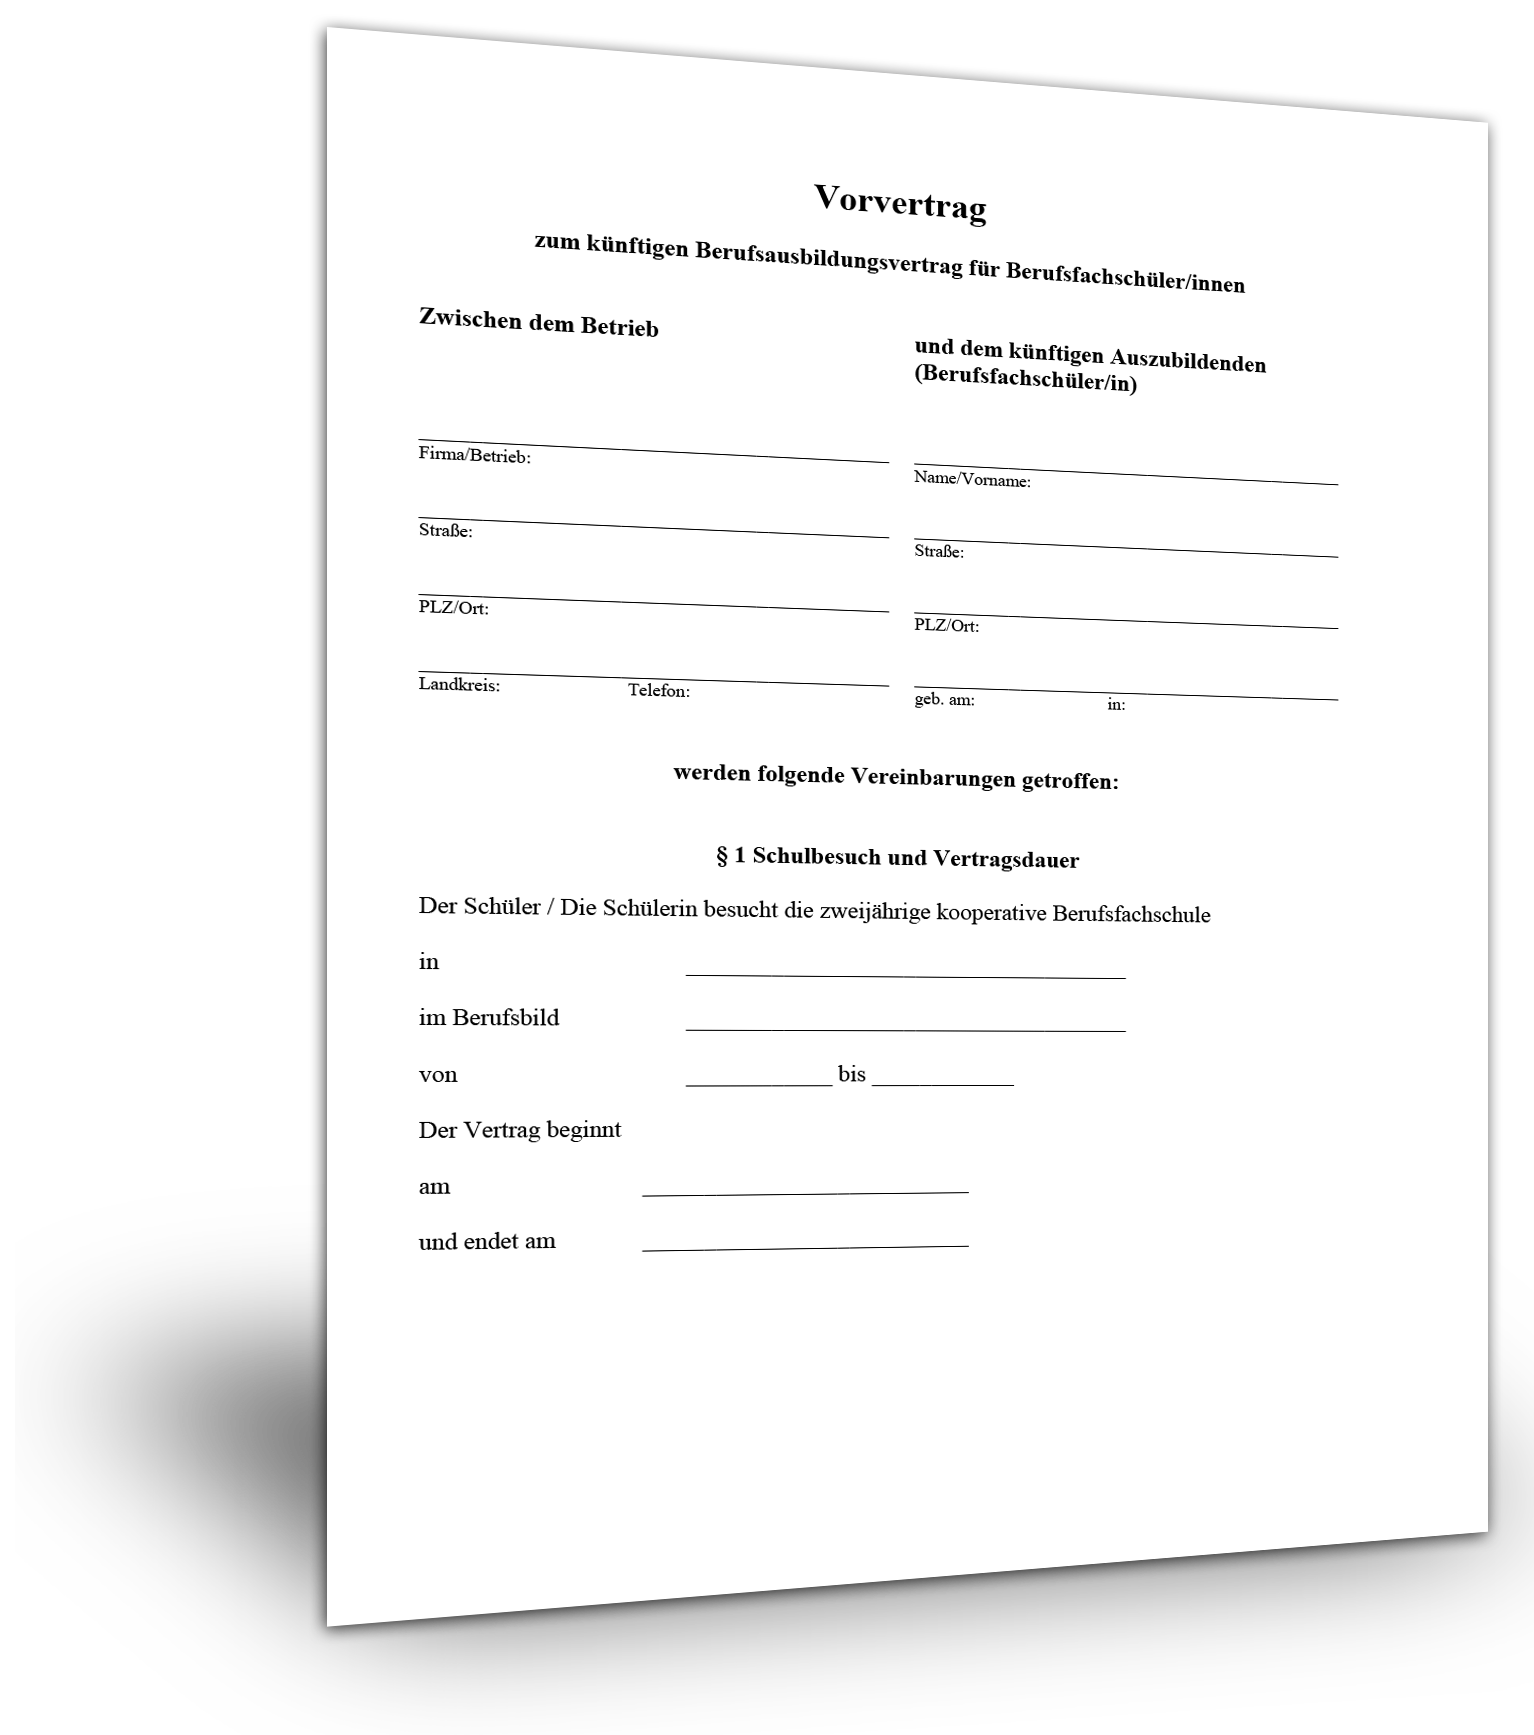 Vorvertrag Berufsausbildung Muster Standardvertraegede